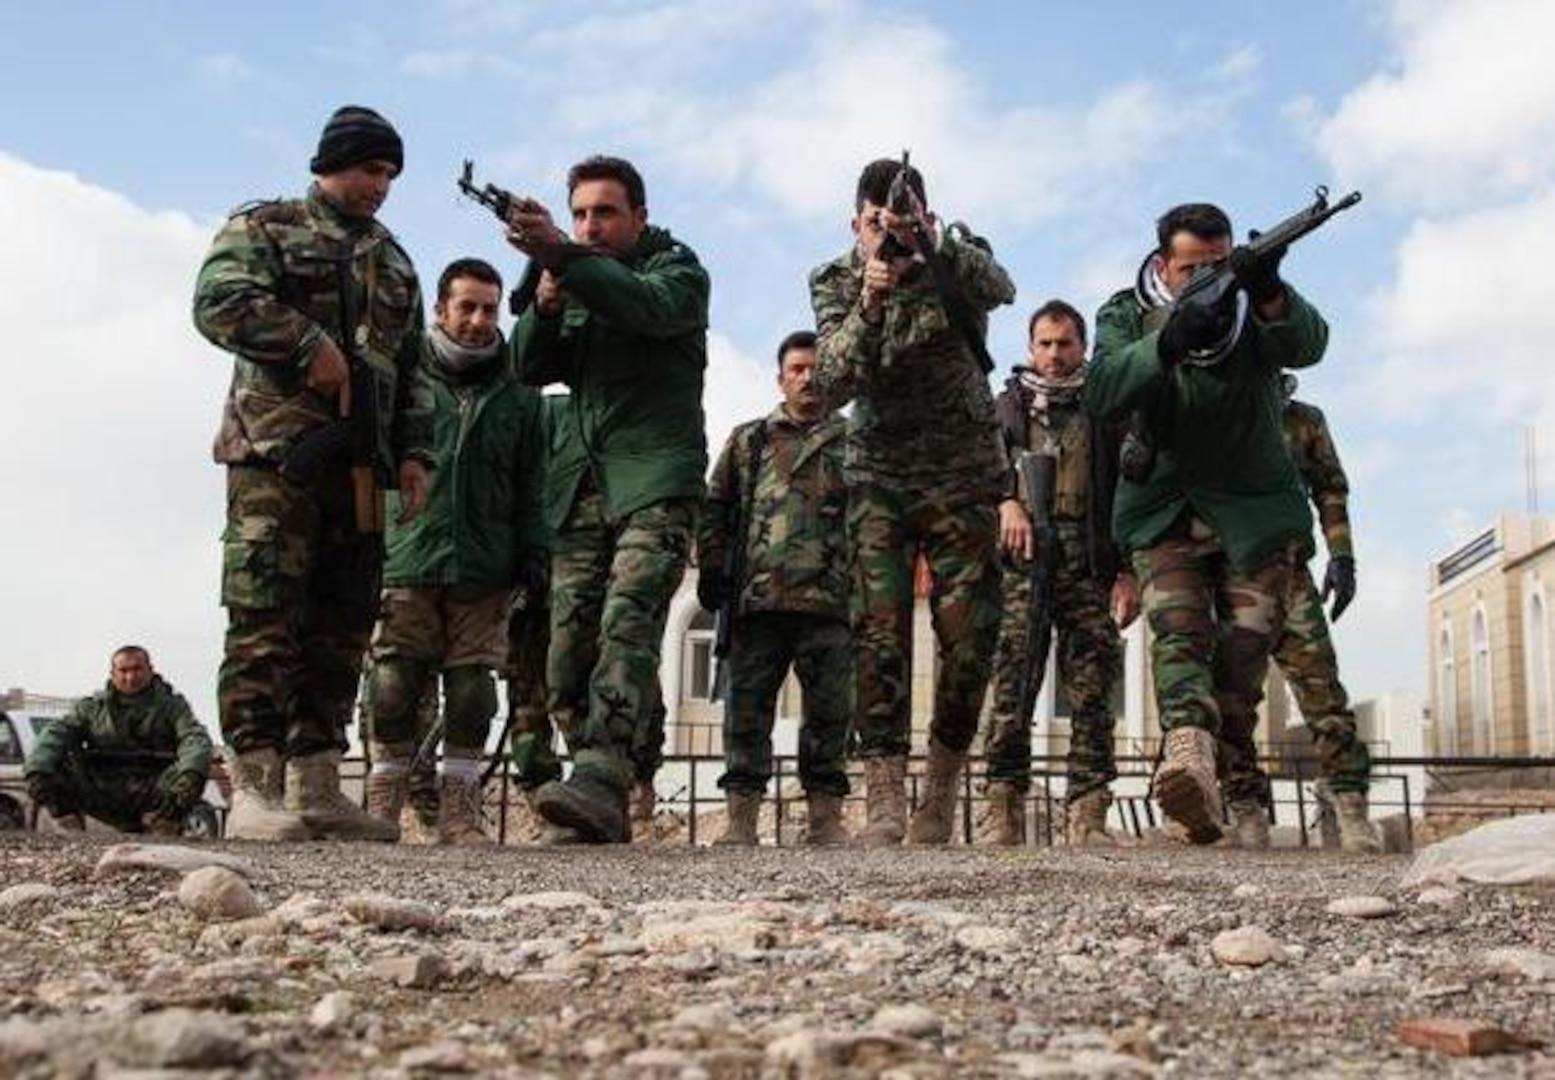 Peshmerga soldiers rehearse urban tactical movement at a training base near Irbil, Iraq, Jan. 26, 2016. (Army photo by Spc. Jessica Hurst)